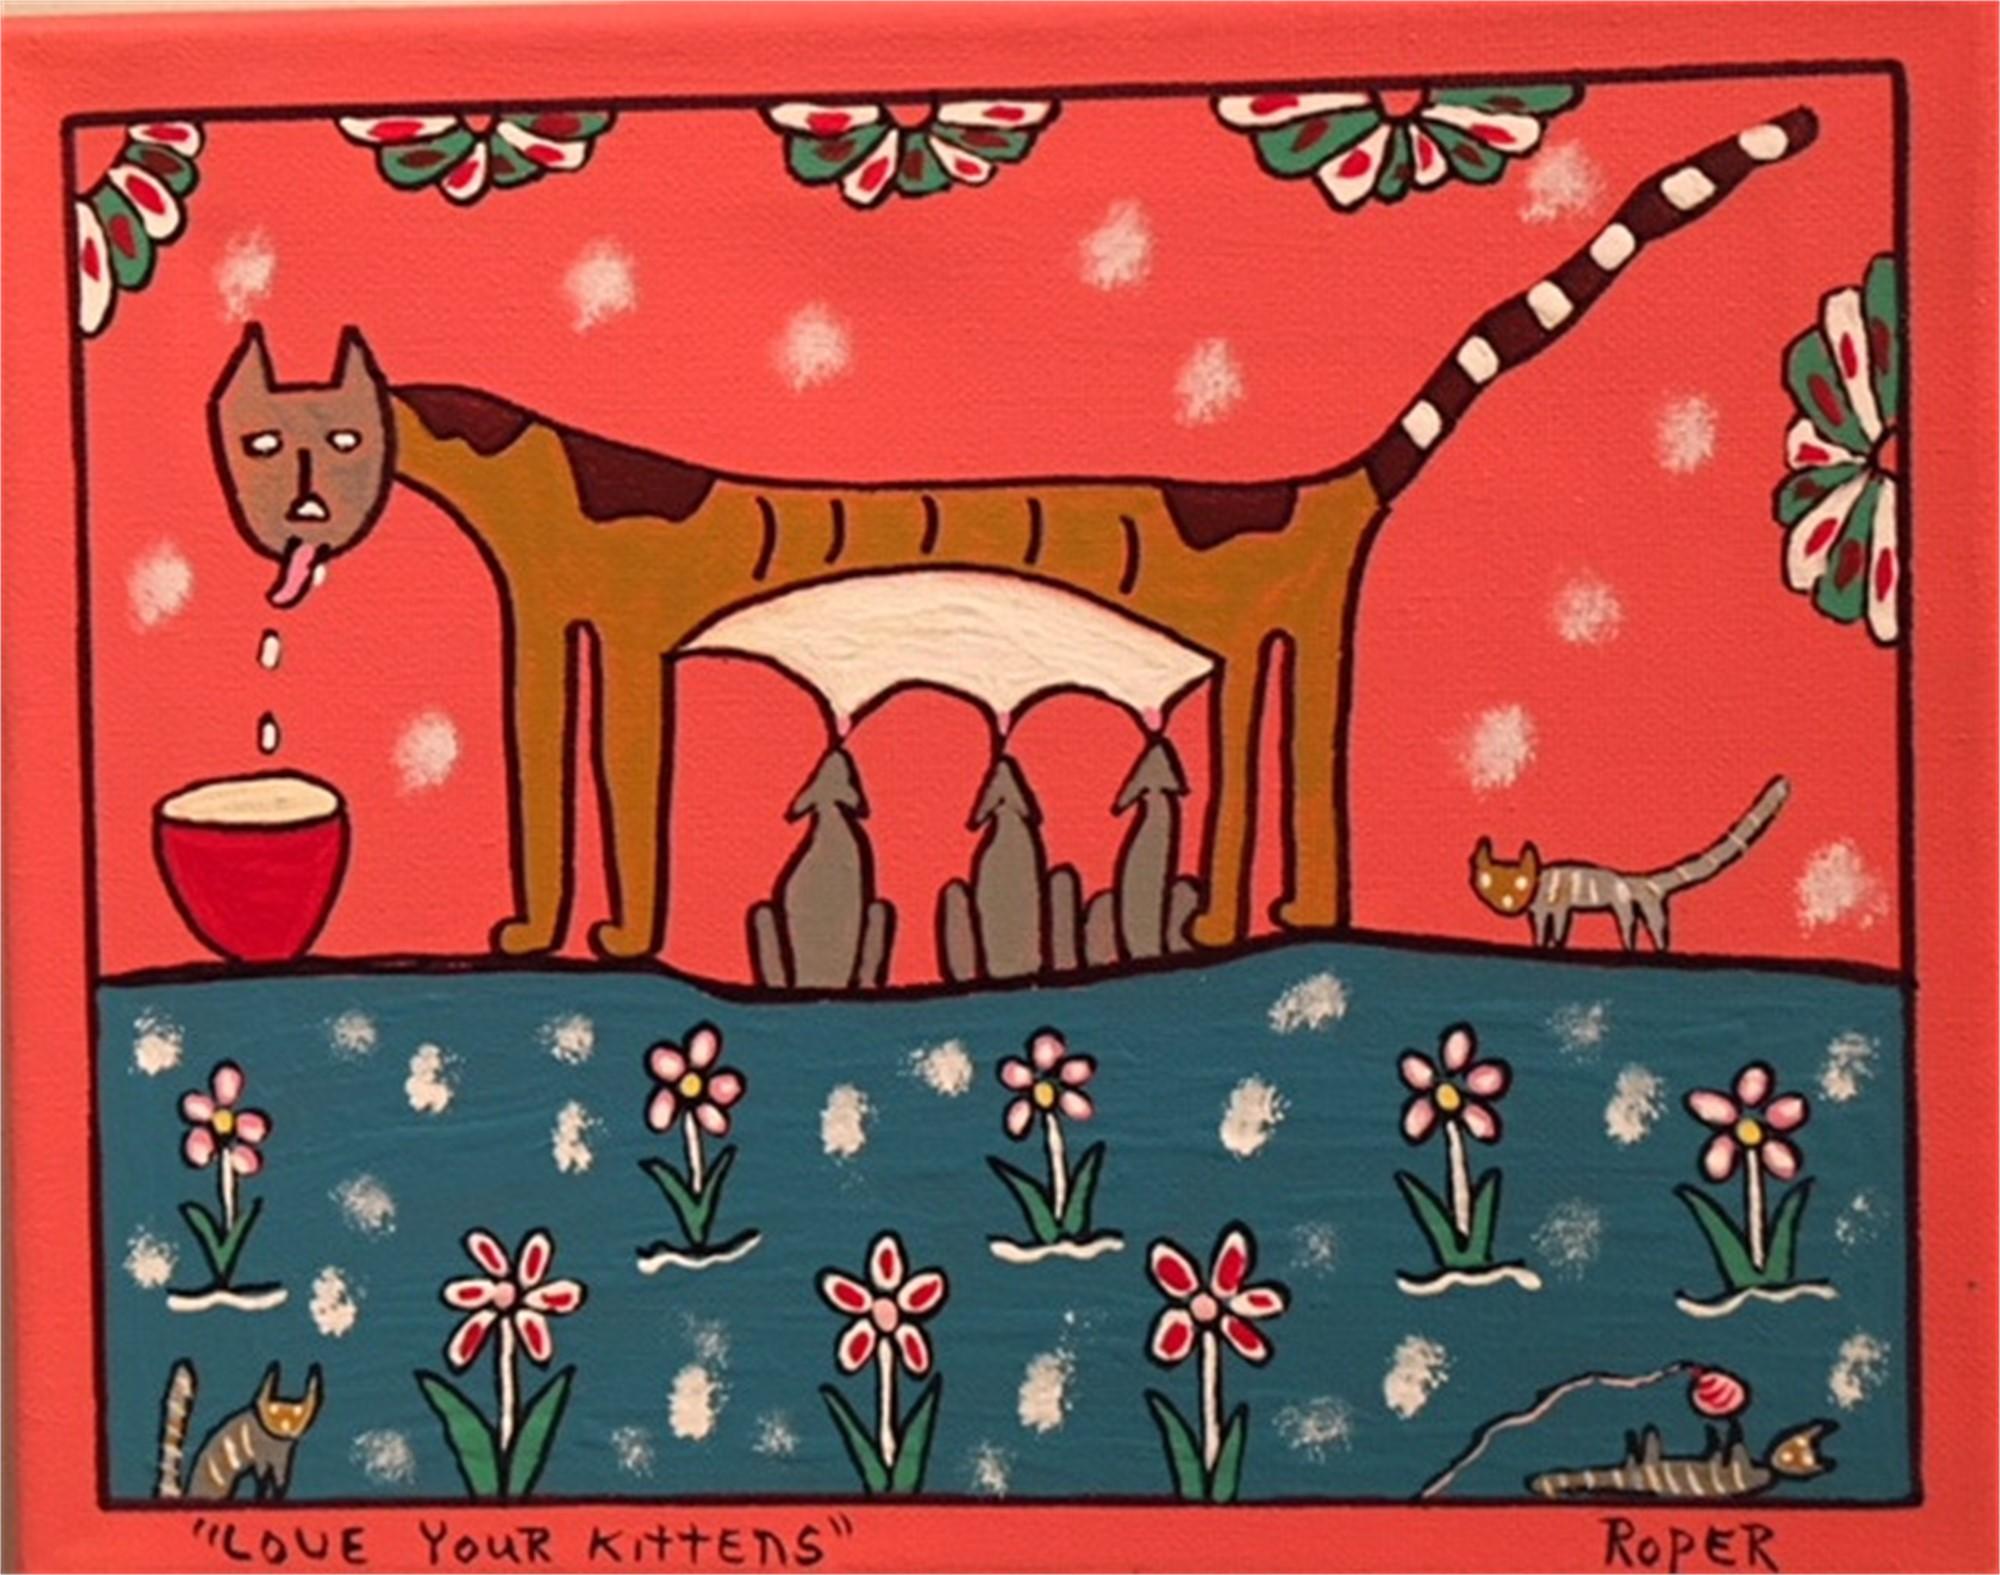 Love Your Kitten by Billy Roper